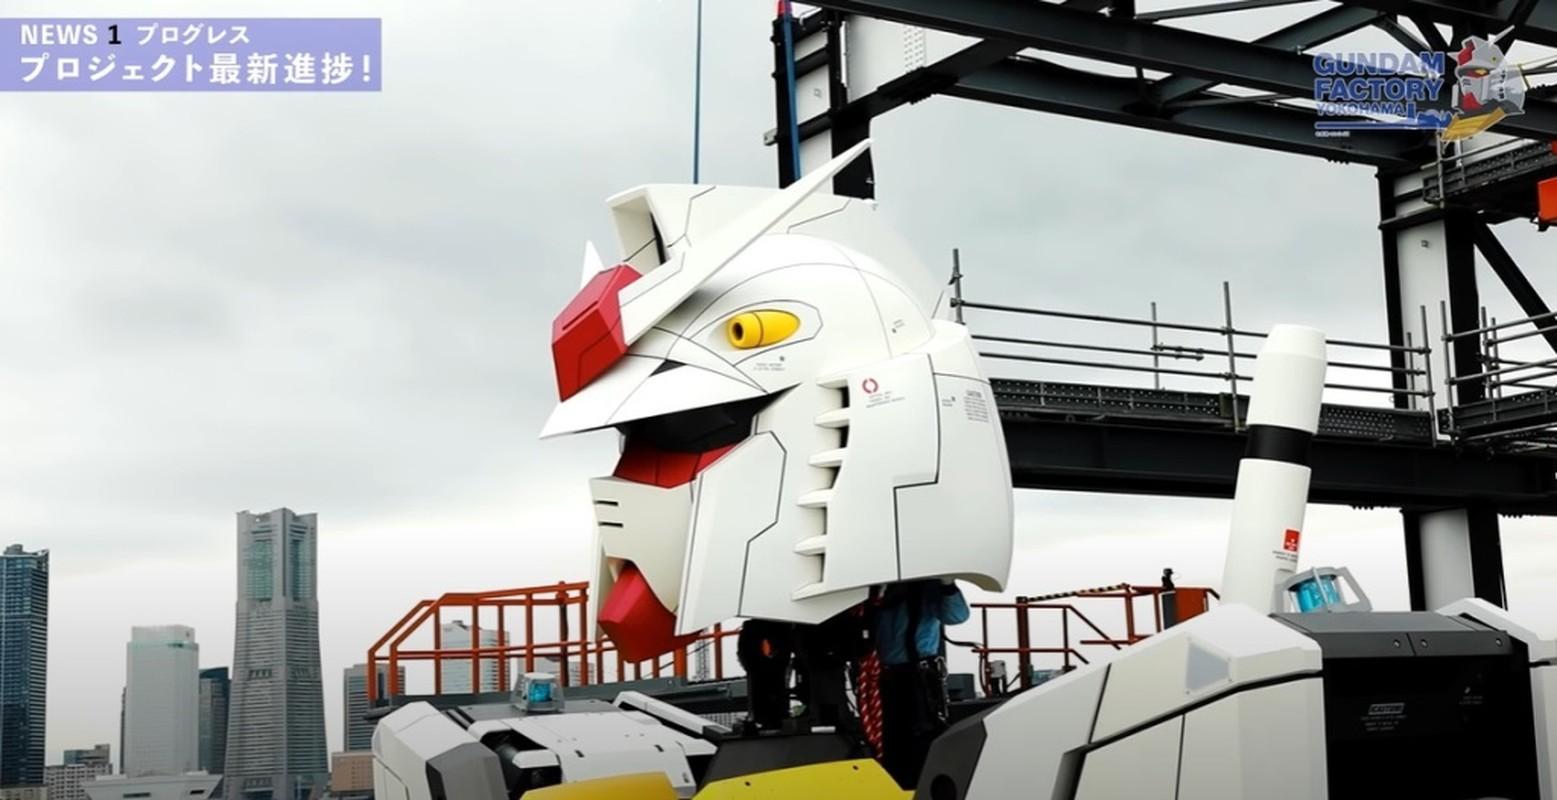 Sieu robot RX-78 Gundam 25 tan co kha nang dac biet gi?-Hinh-13